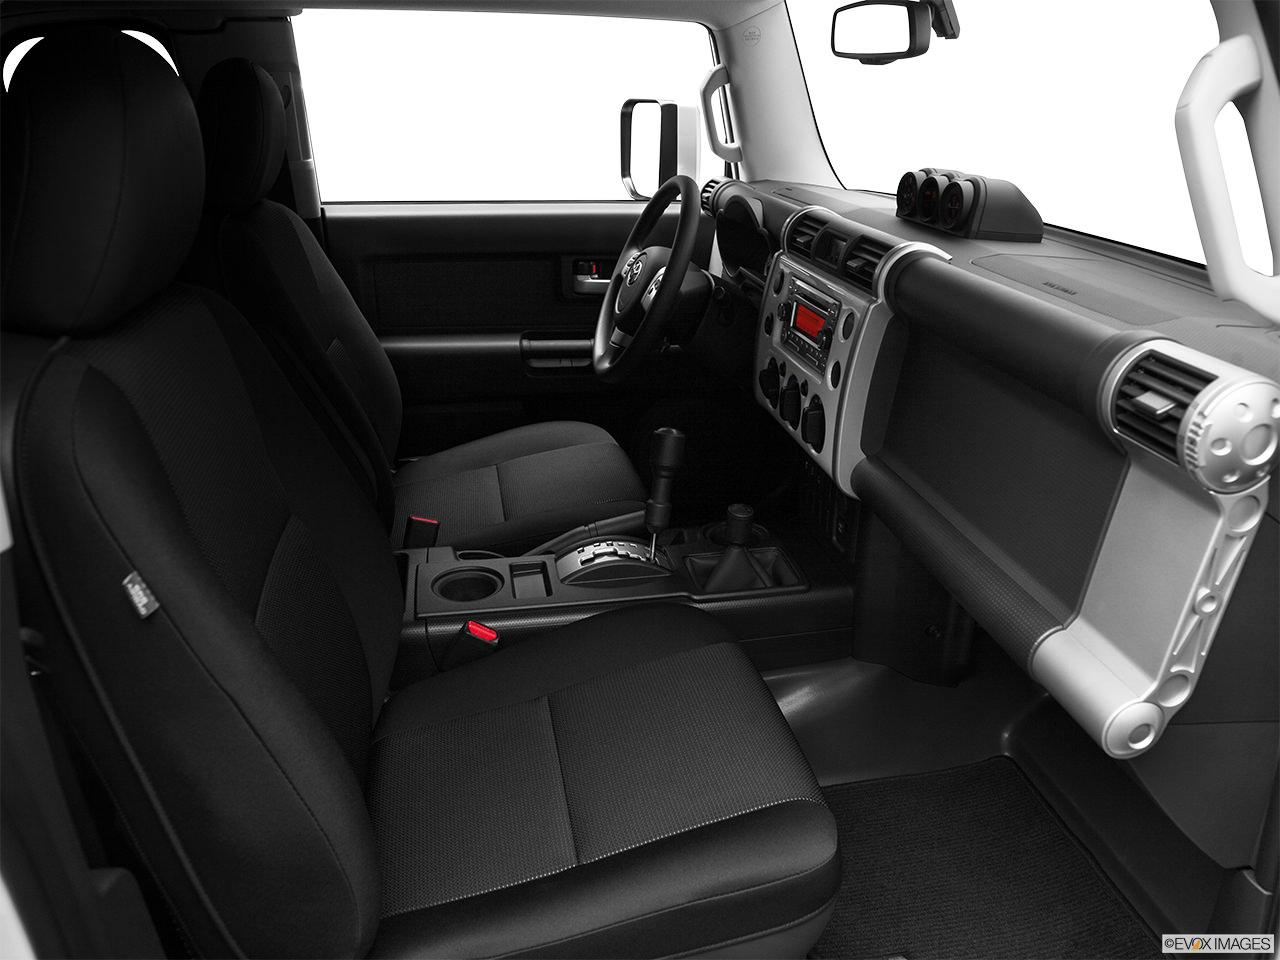 Toyota FJ cruiser 2012 interior